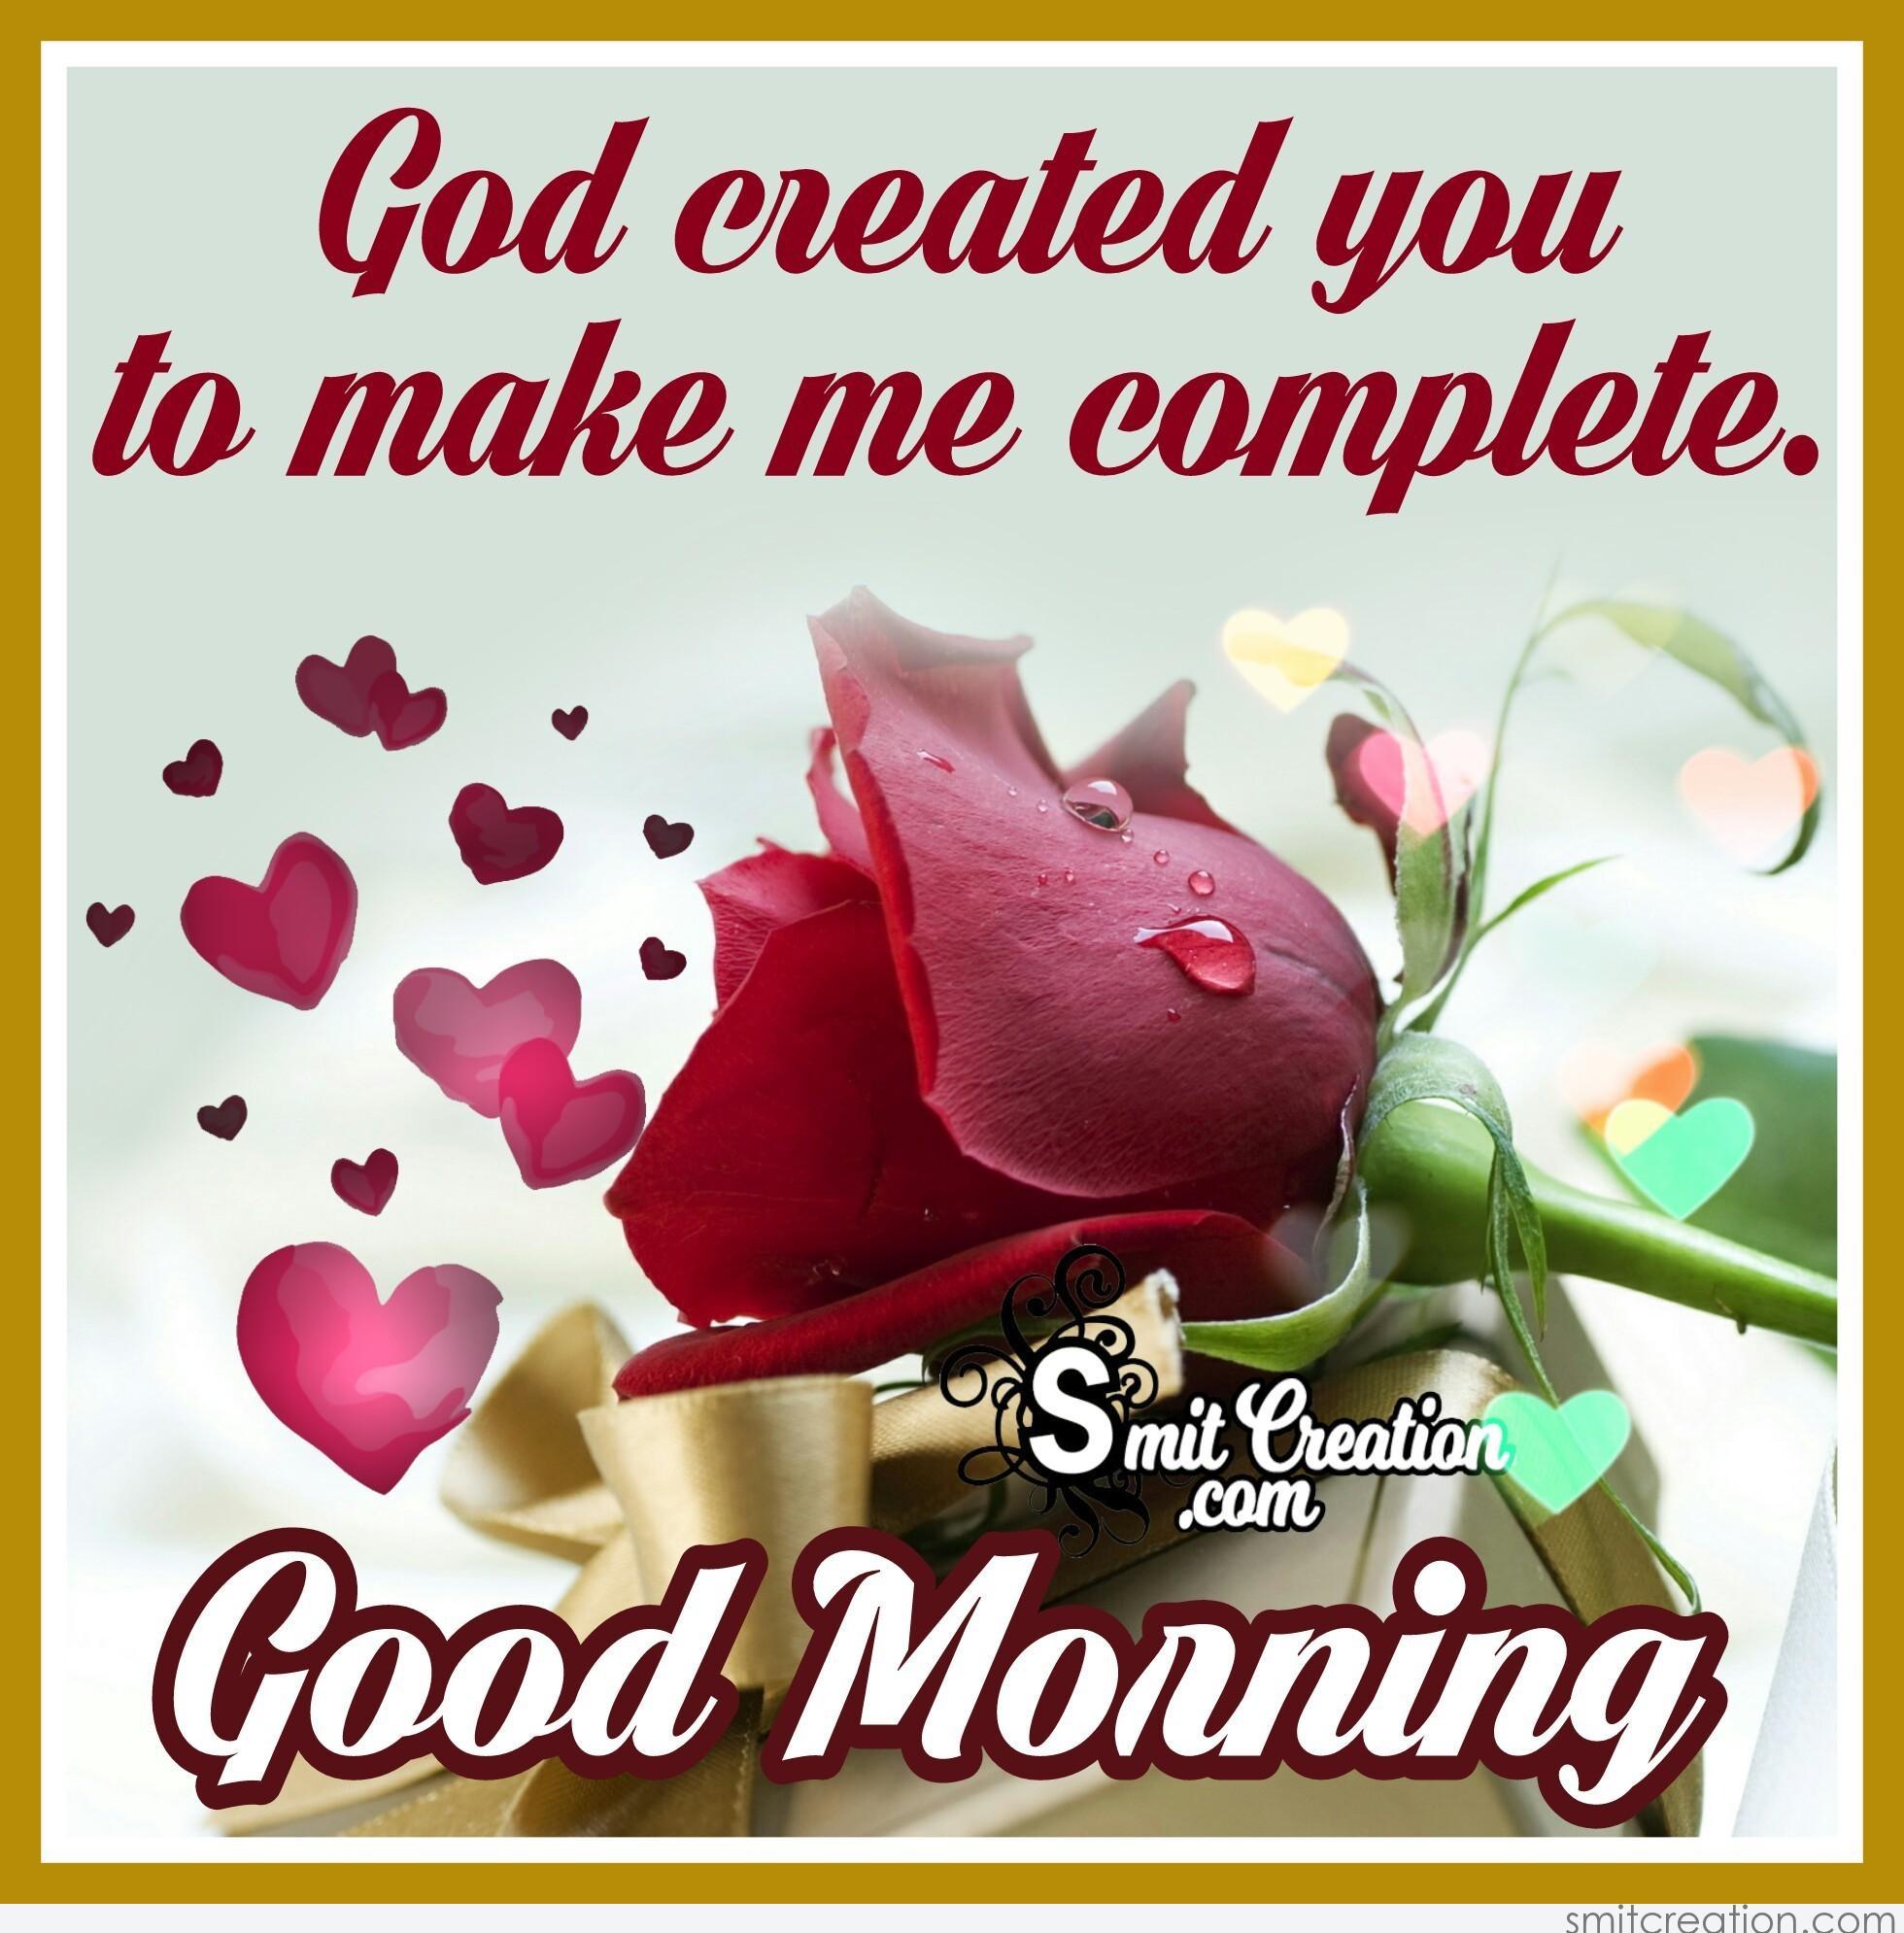 Good Morning God Created You To Make Me Complete Smitcreation